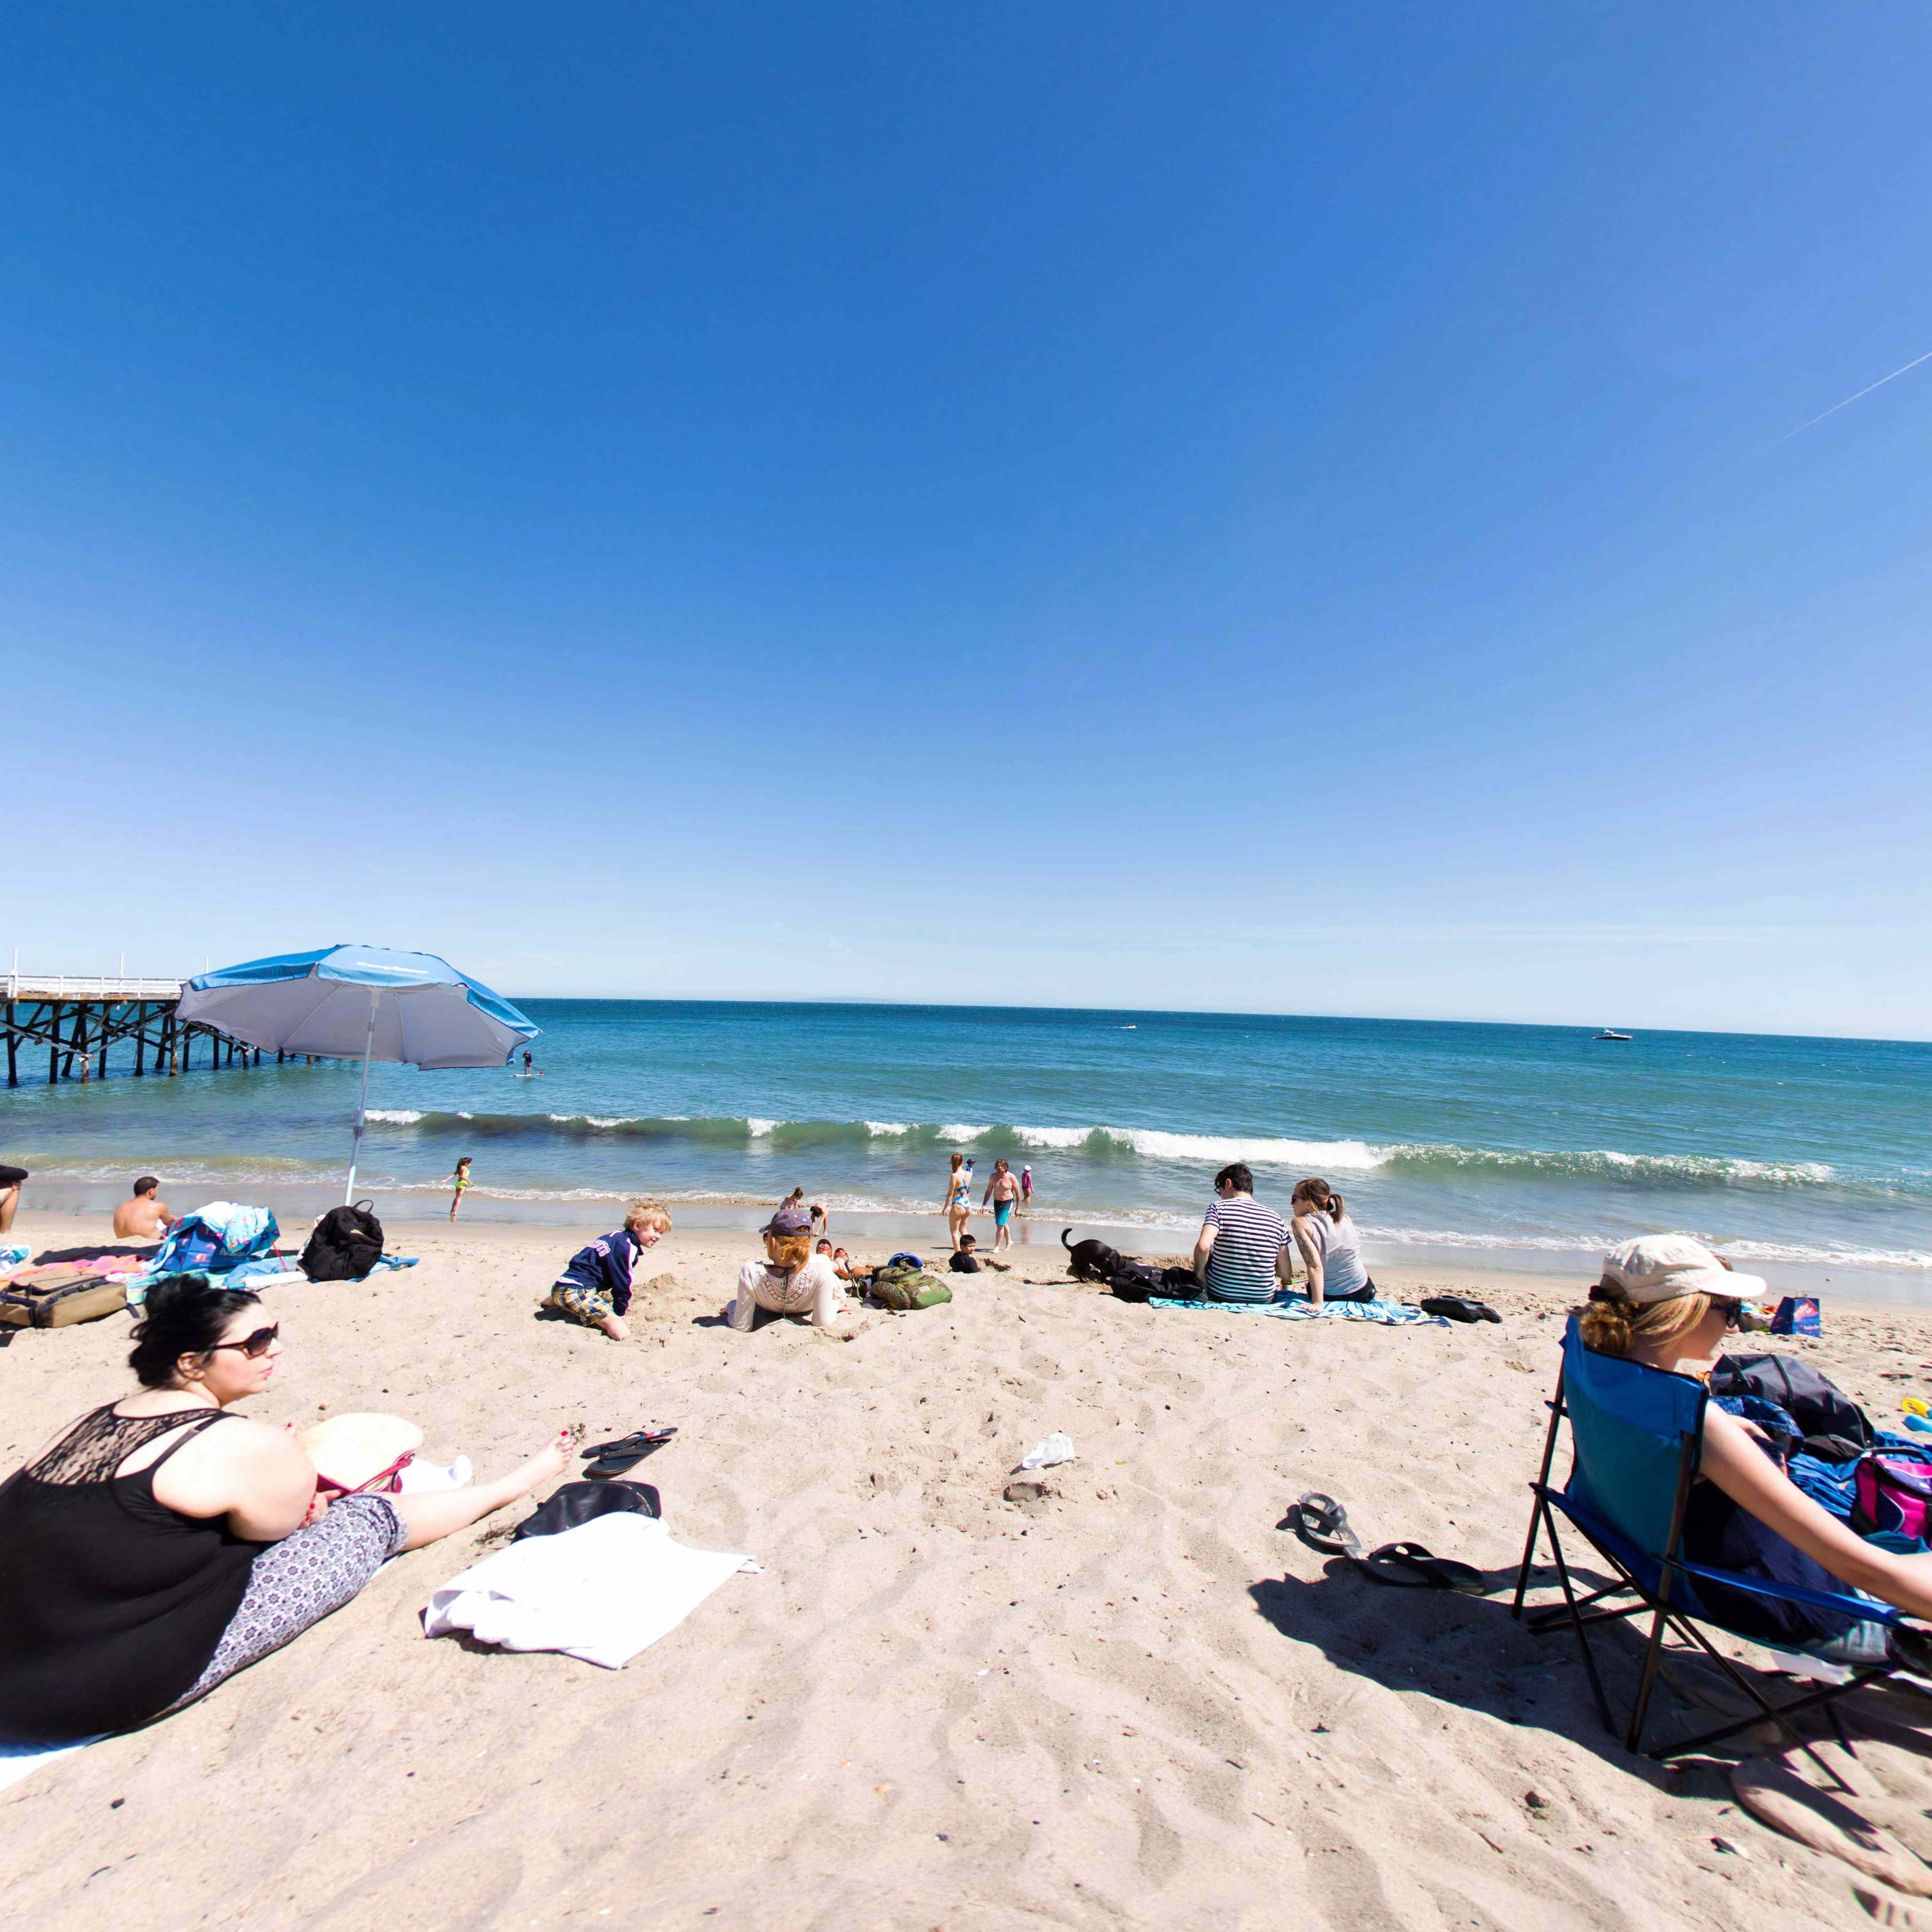 Malibu Beach Club Long Island Address Best On The World 2017